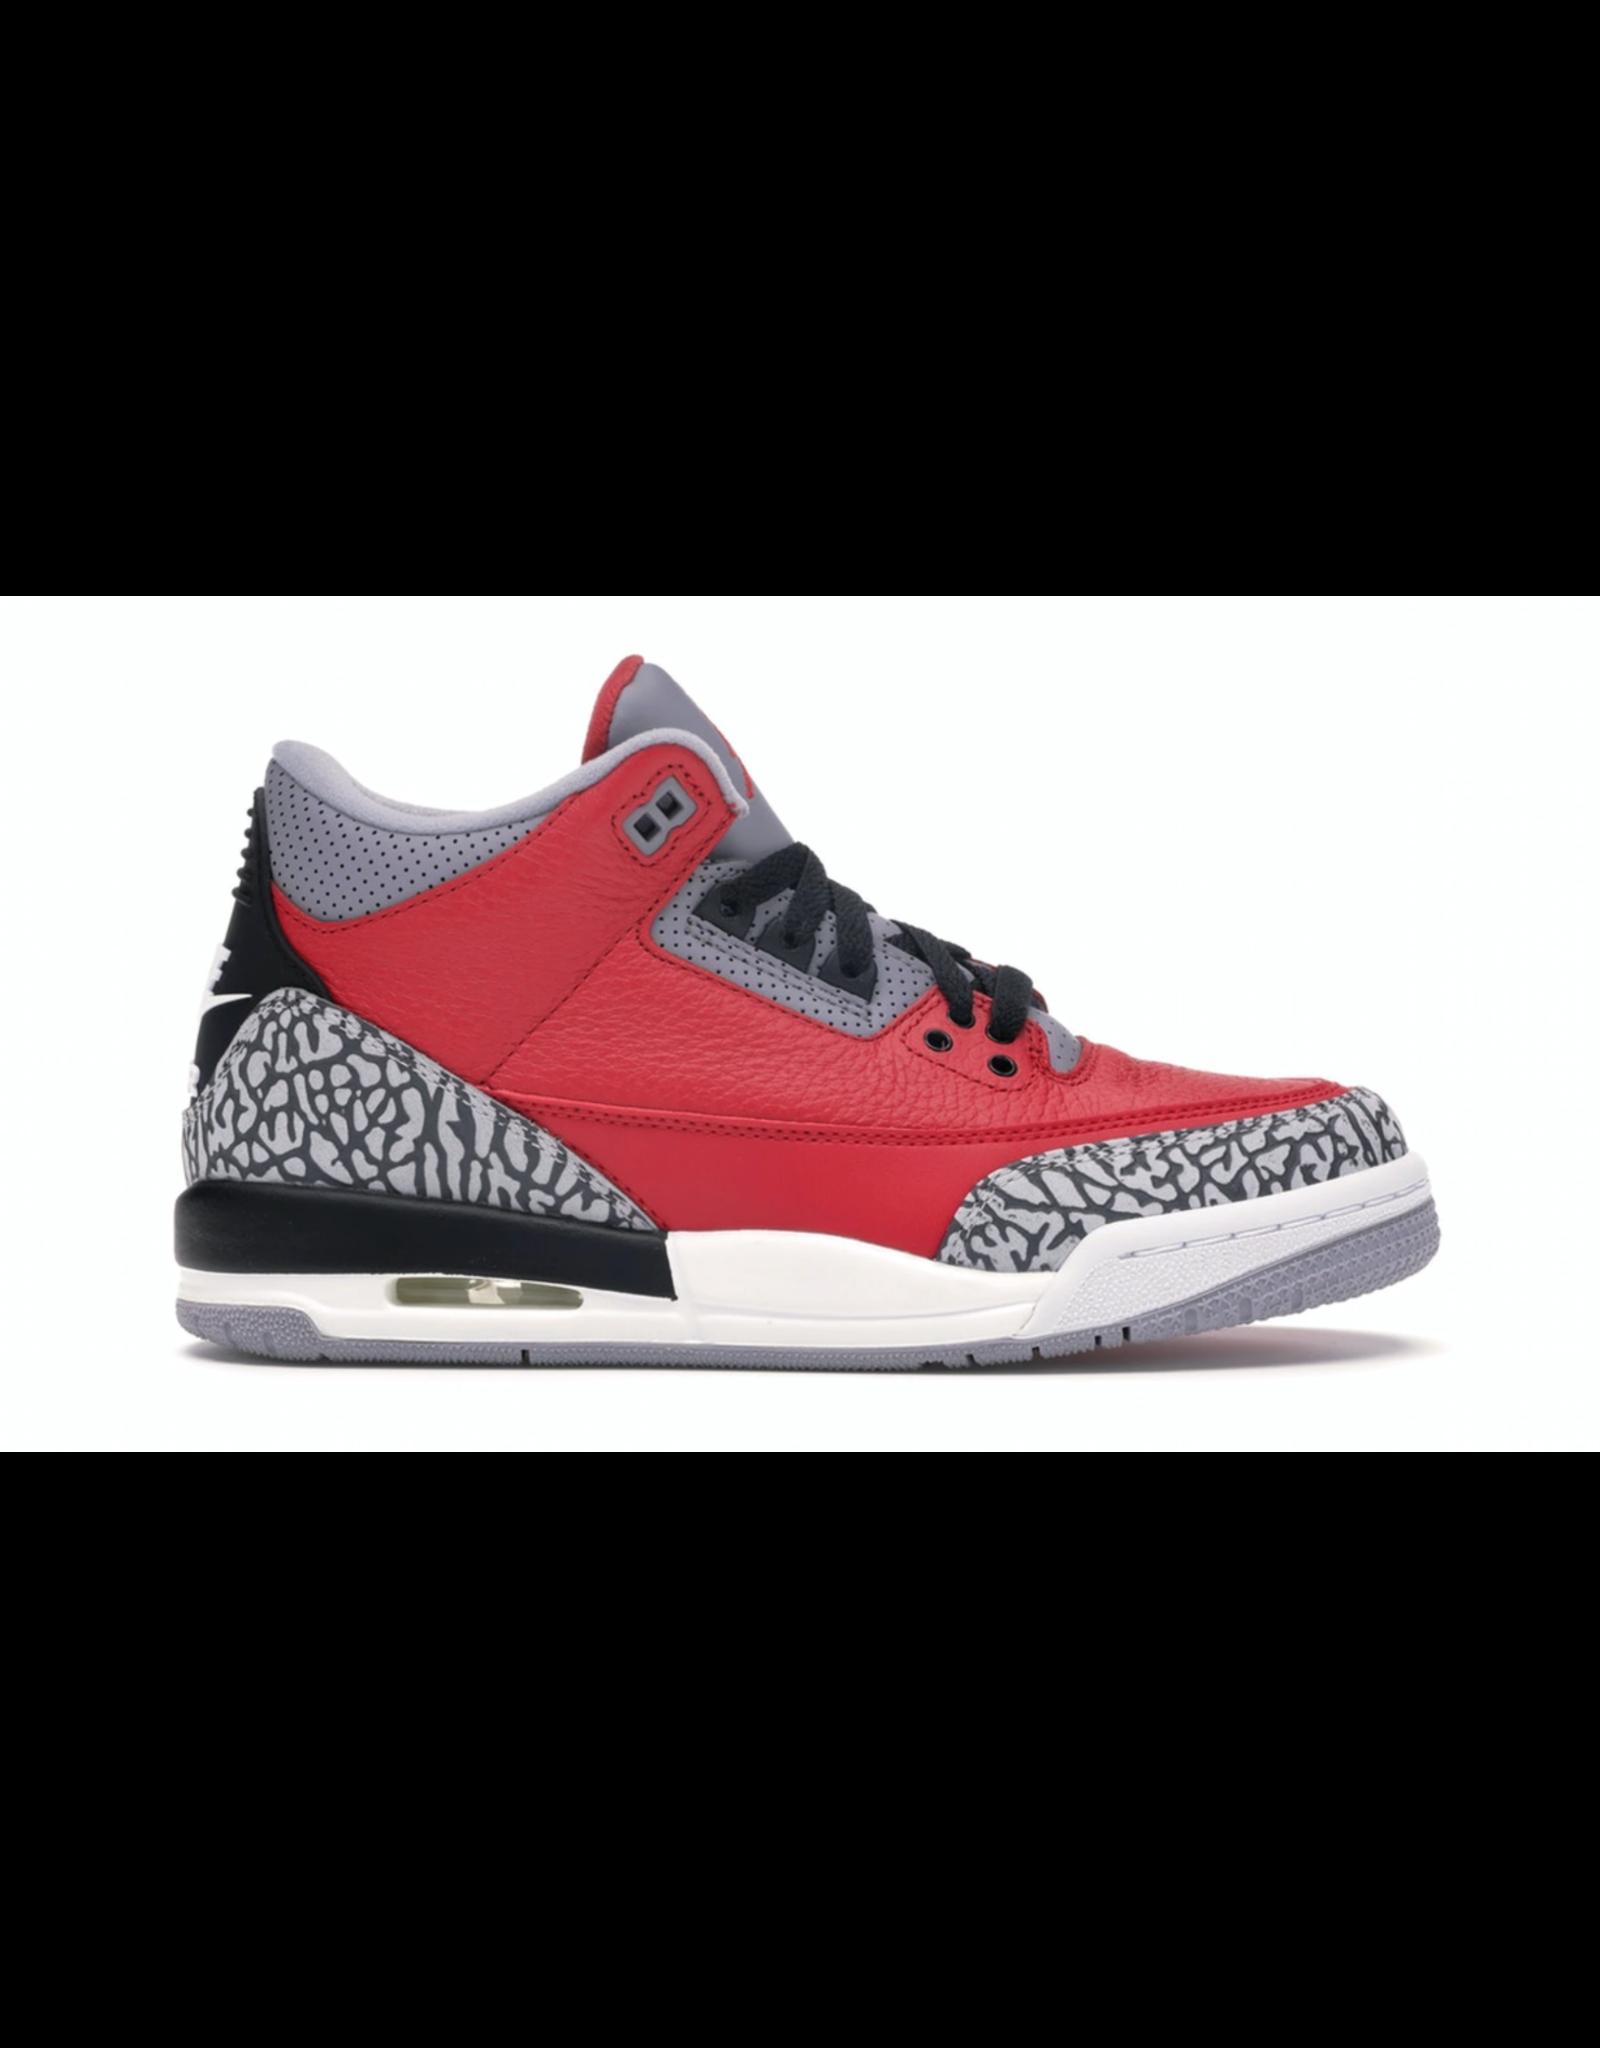 JORDAN Jordan 3 Retro SE Fire Red (GS)